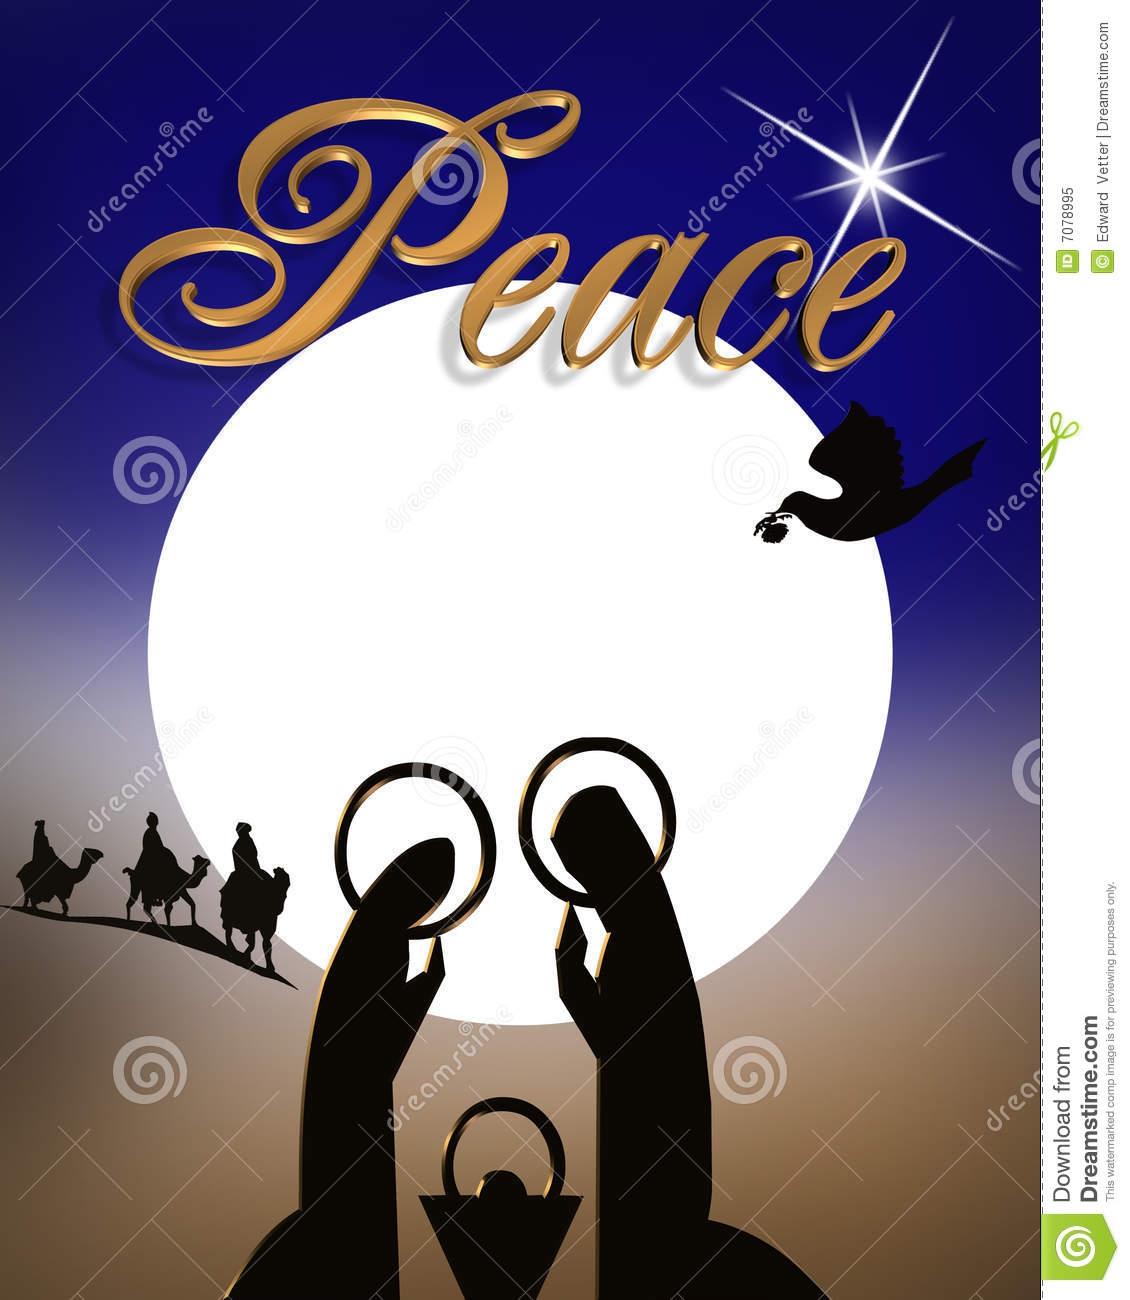 religious christmas cards clipart #1